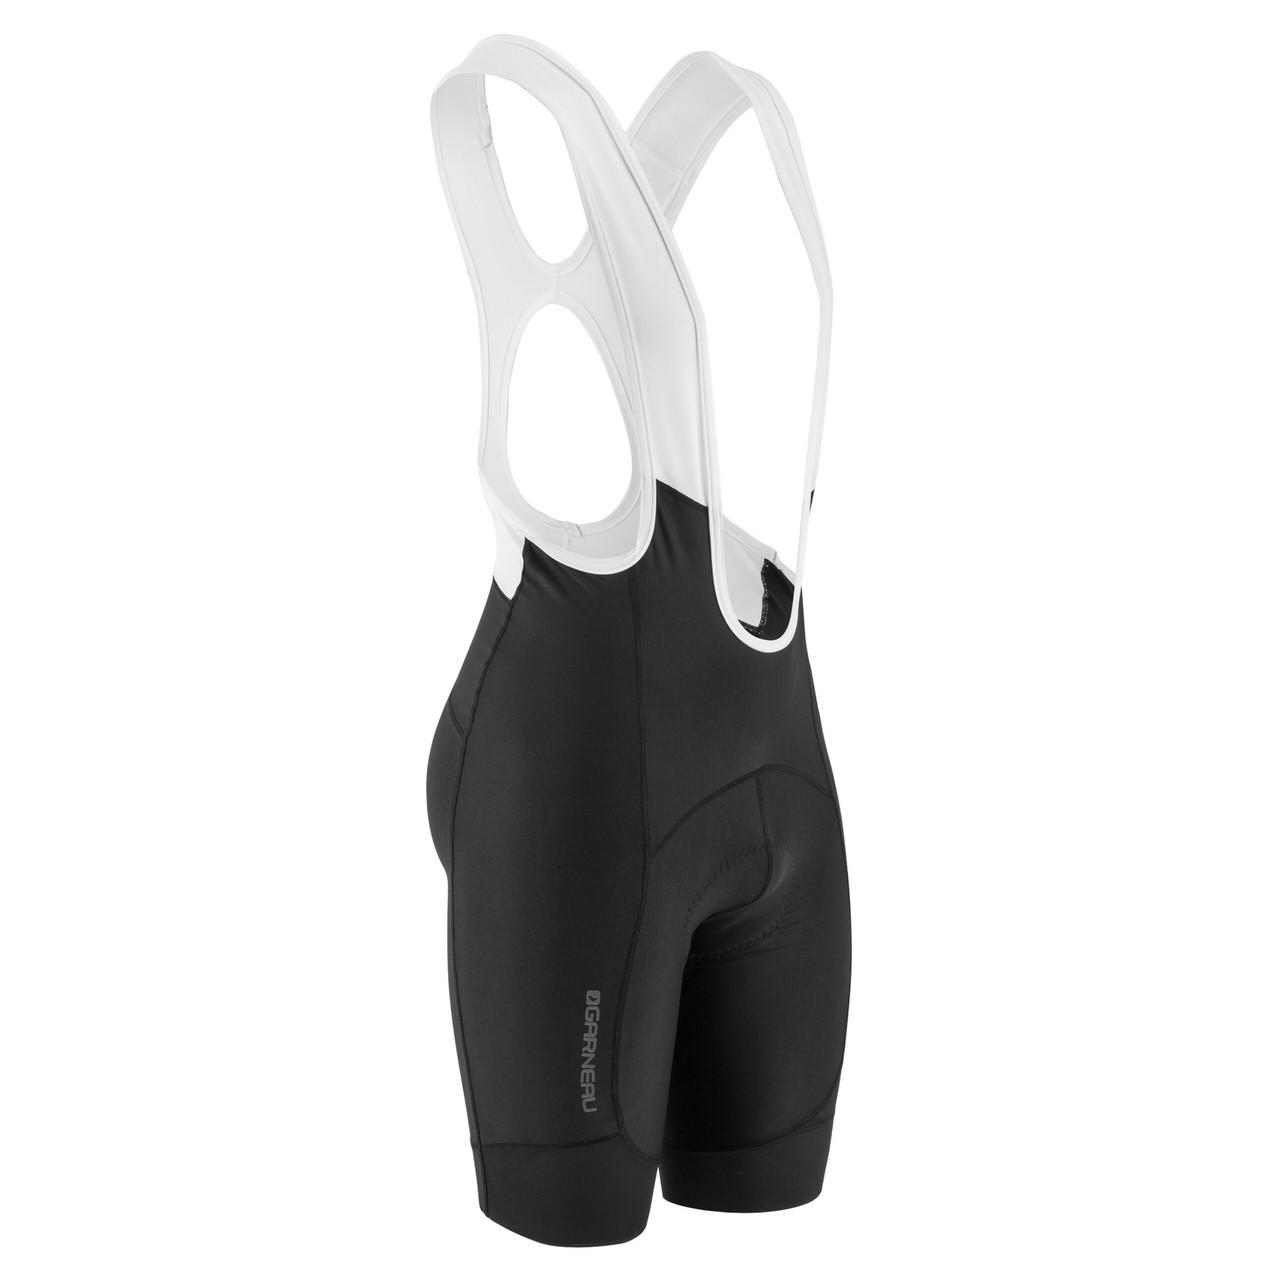 Louis Garneau Neo Power Motion Cyling Bib Shorts Men/'s XXL Black